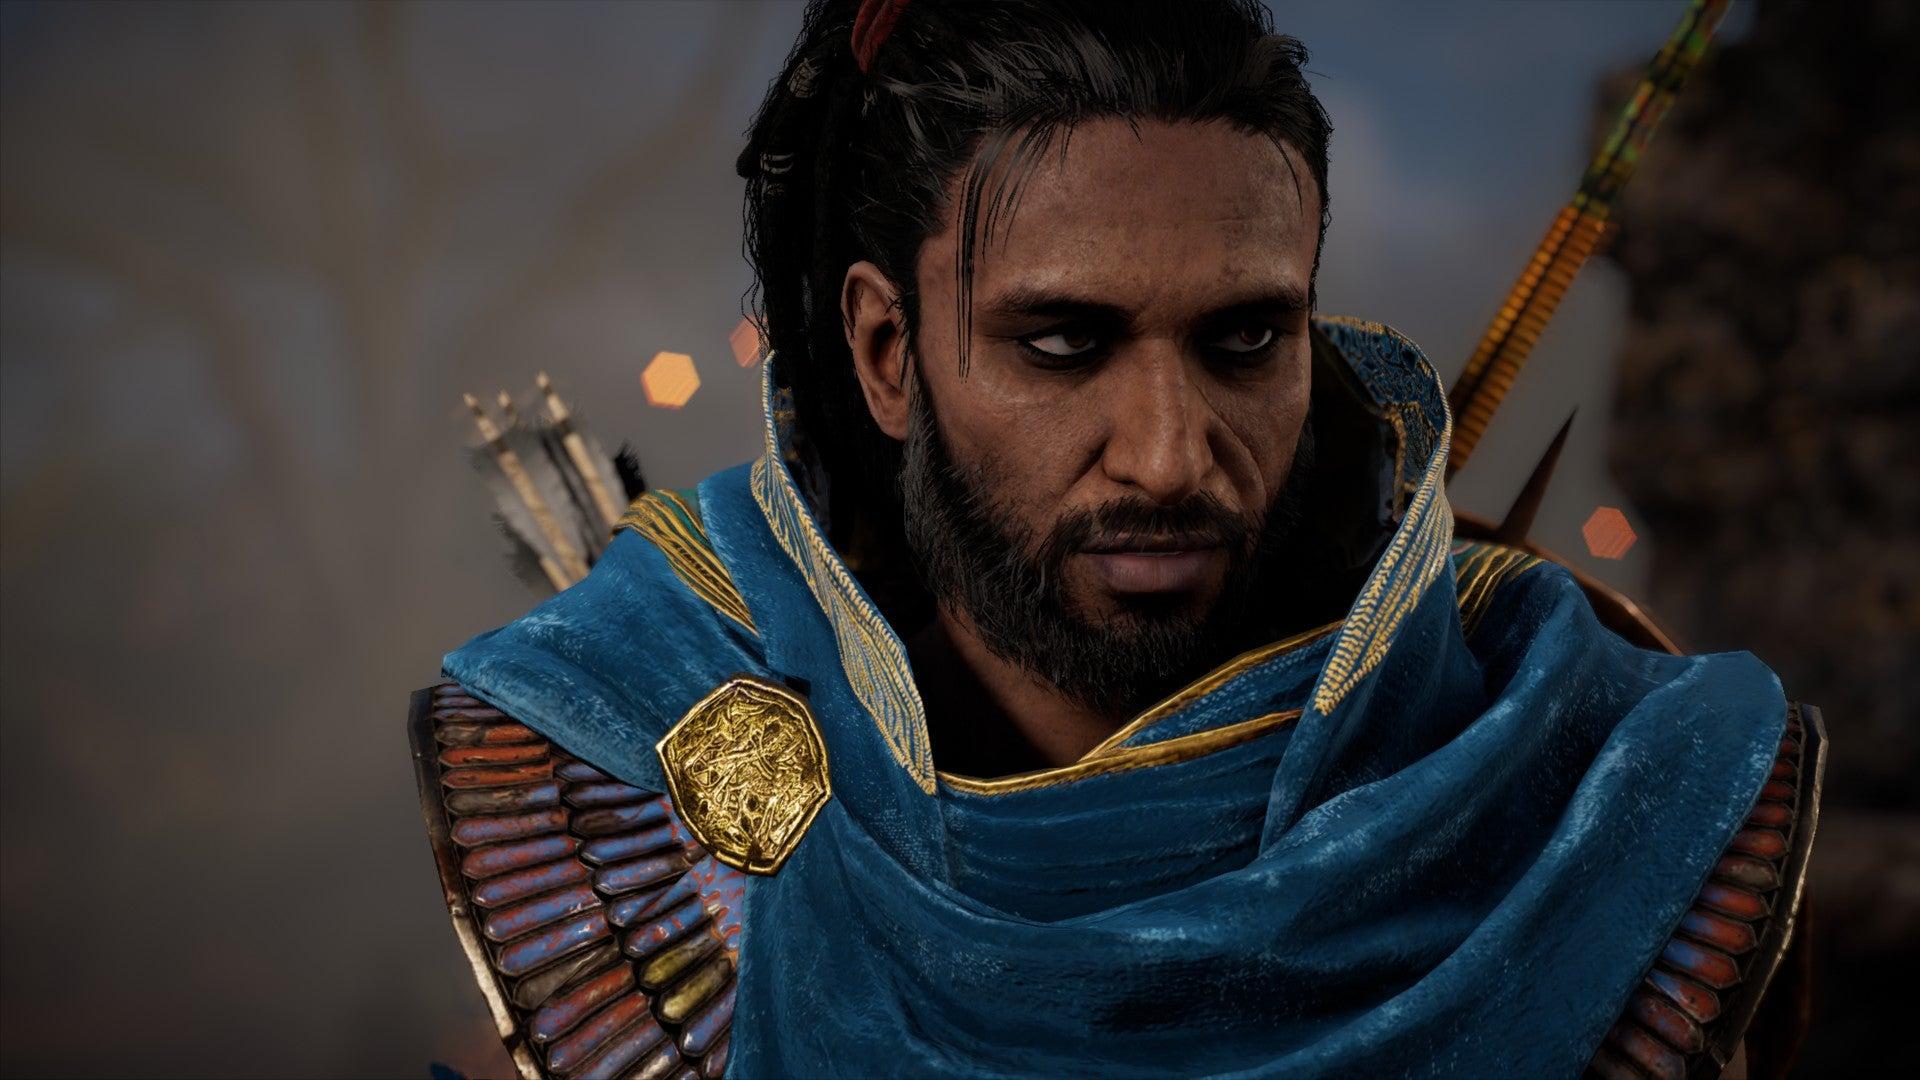 Assassin's Creed Assassins, Ranked